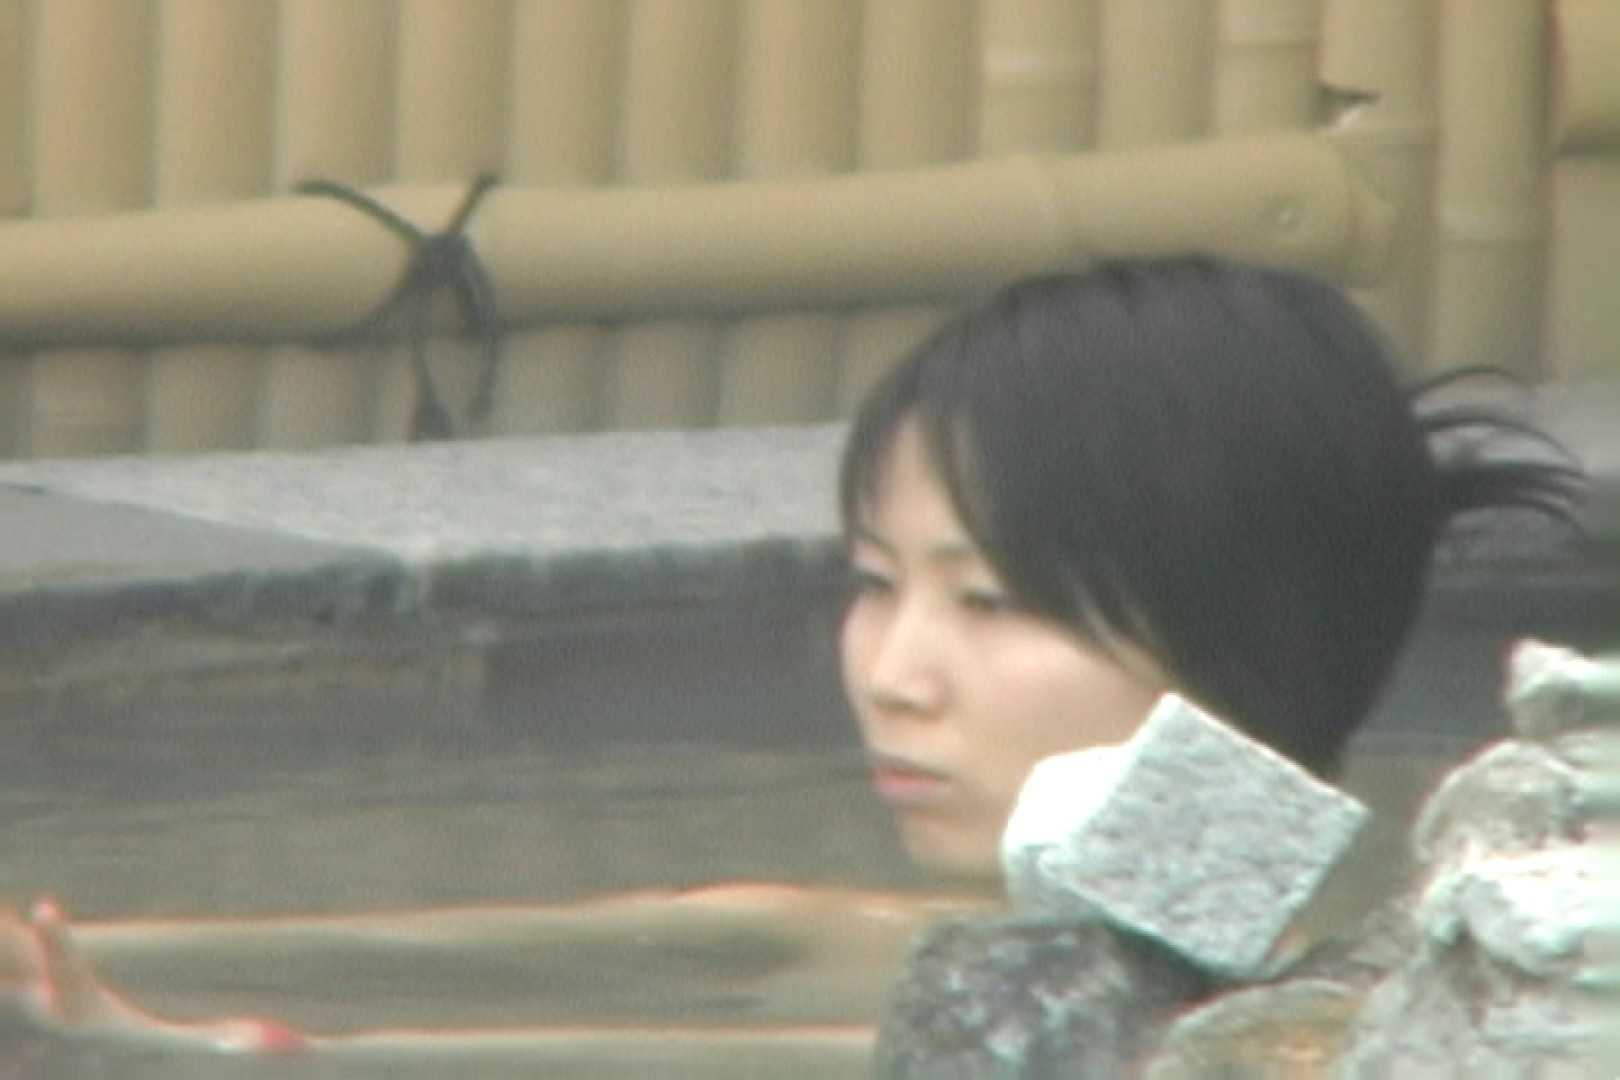 Aquaな露天風呂Vol.567 露天 | 盗撮特撮  13pic 7